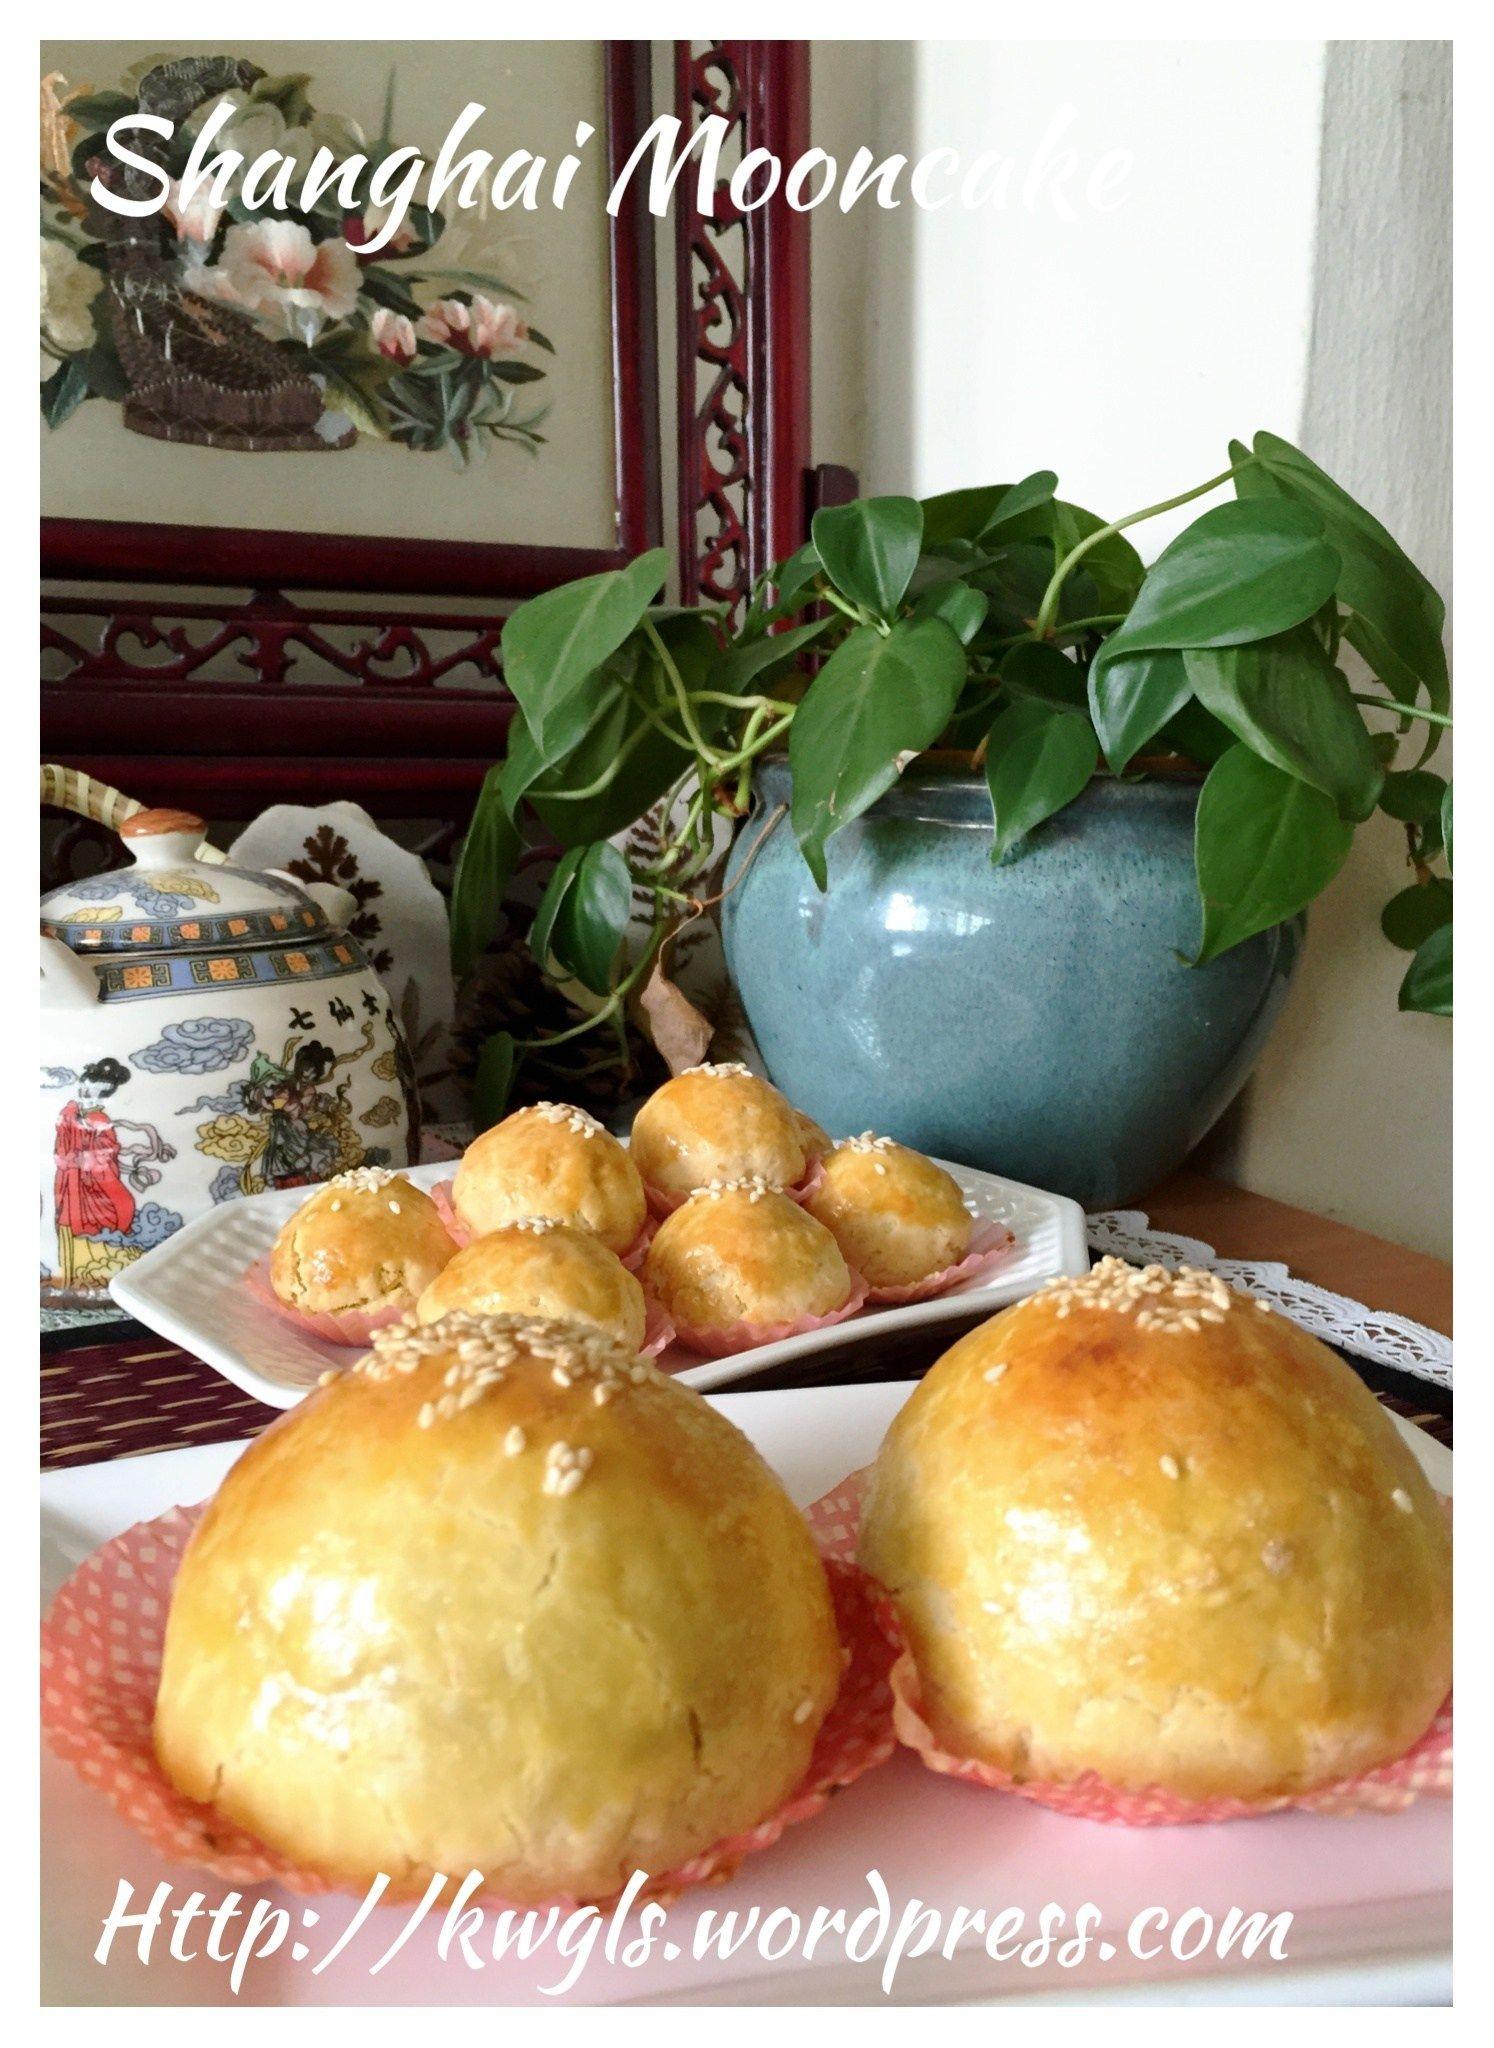 Is This Moon Cake Originates From Shanghai? Shanghai Moon Cake (上海月饼) - Guai Shu Shu #mooncake